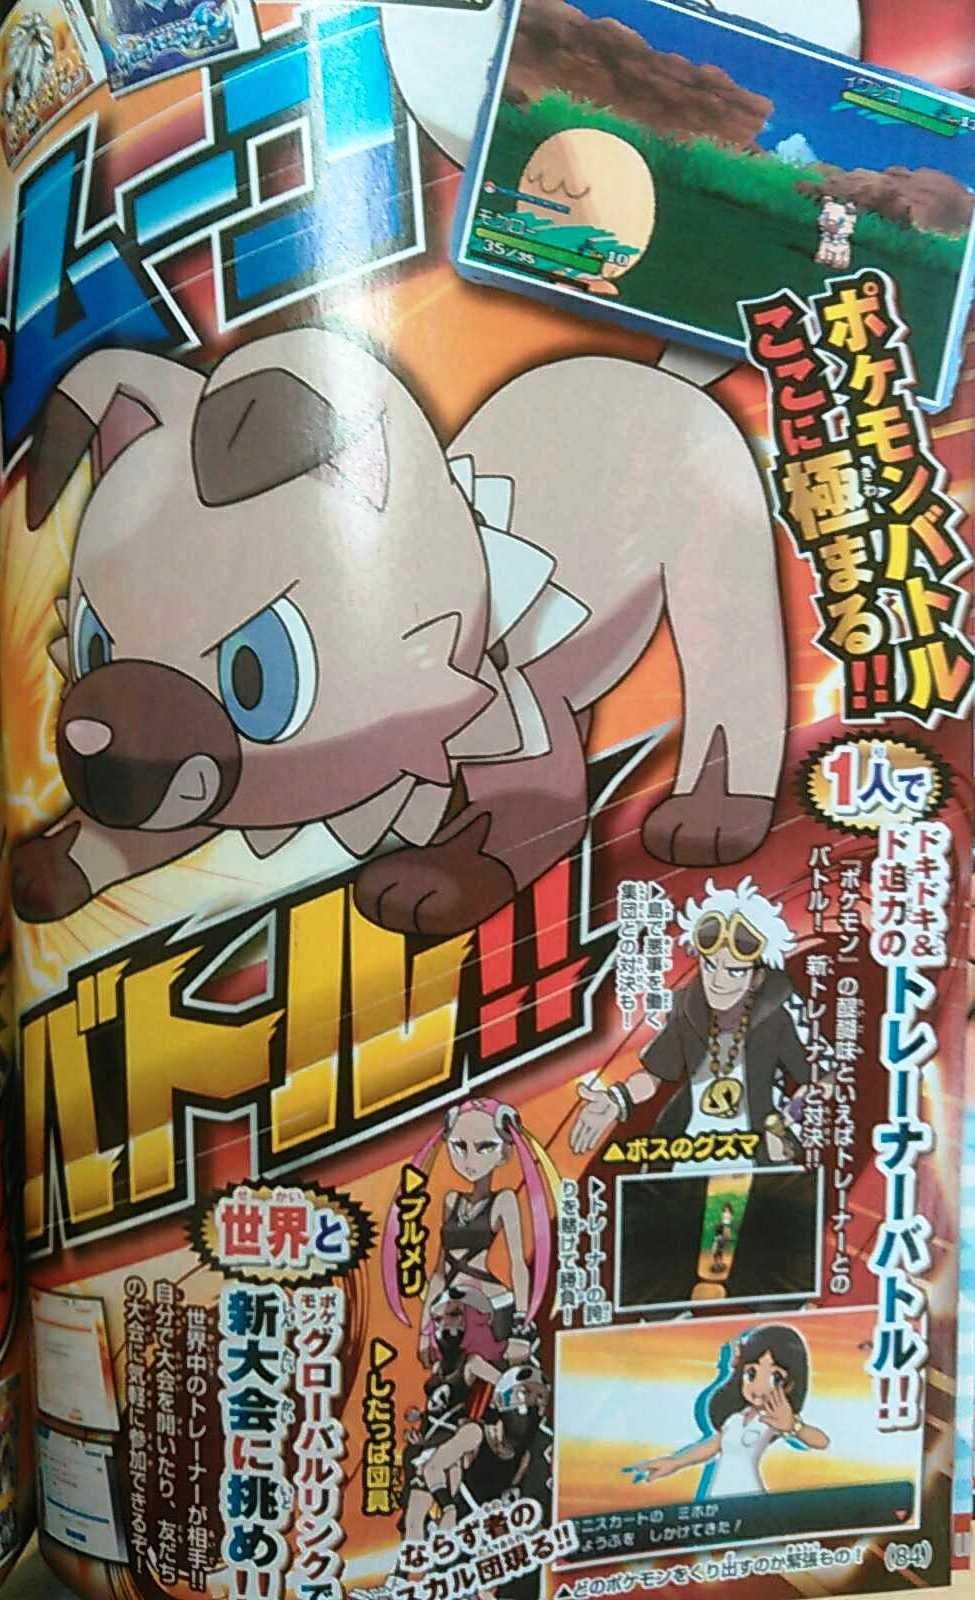 PokemonSoleil 3DS Div 013